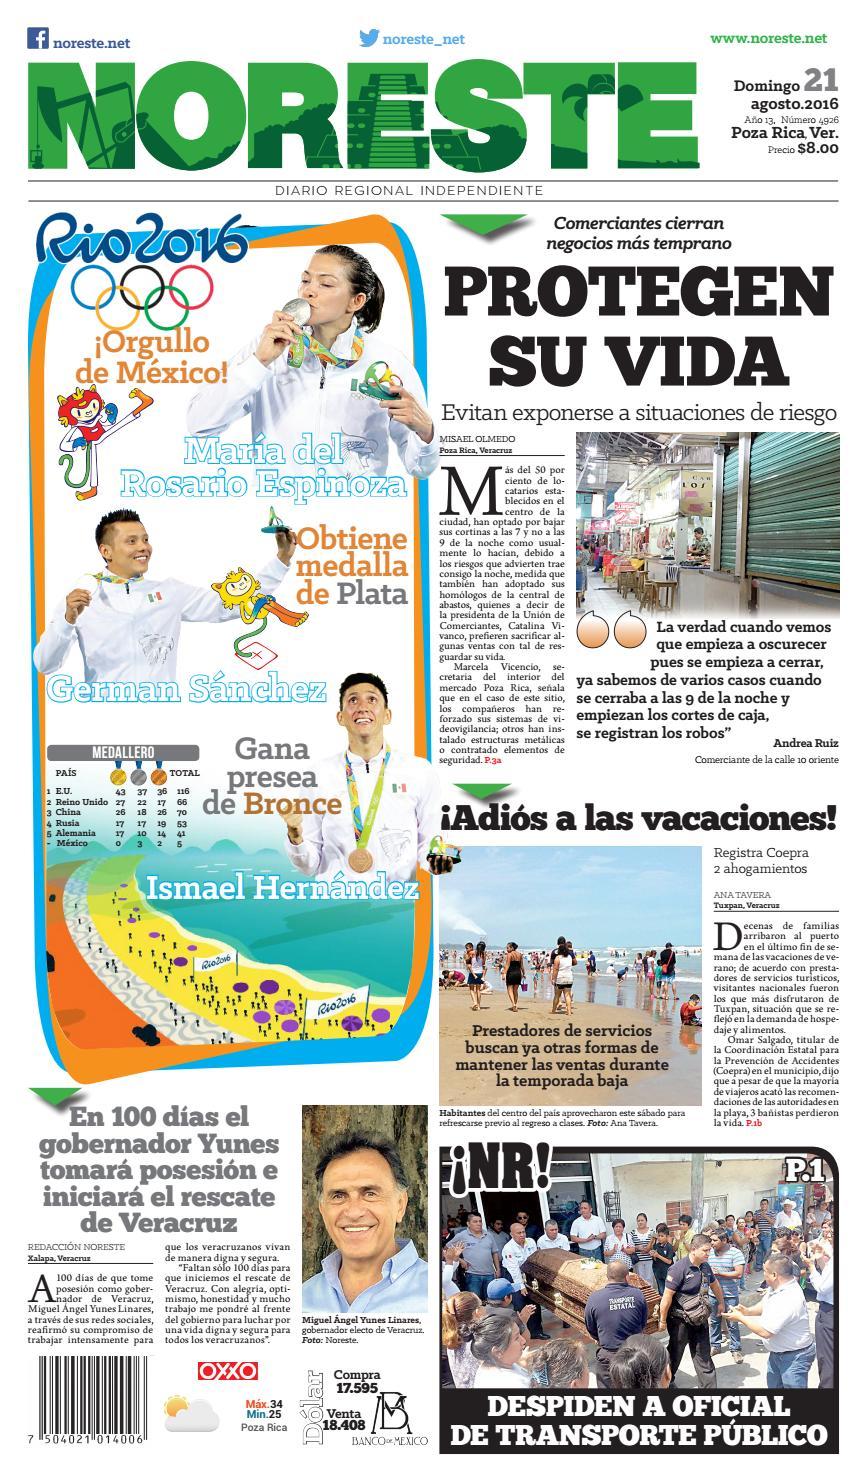 Versi N Impresa 21 De Agosto De 2016 By Noreste Diario Regional  # Cota Muebles Teziutlan